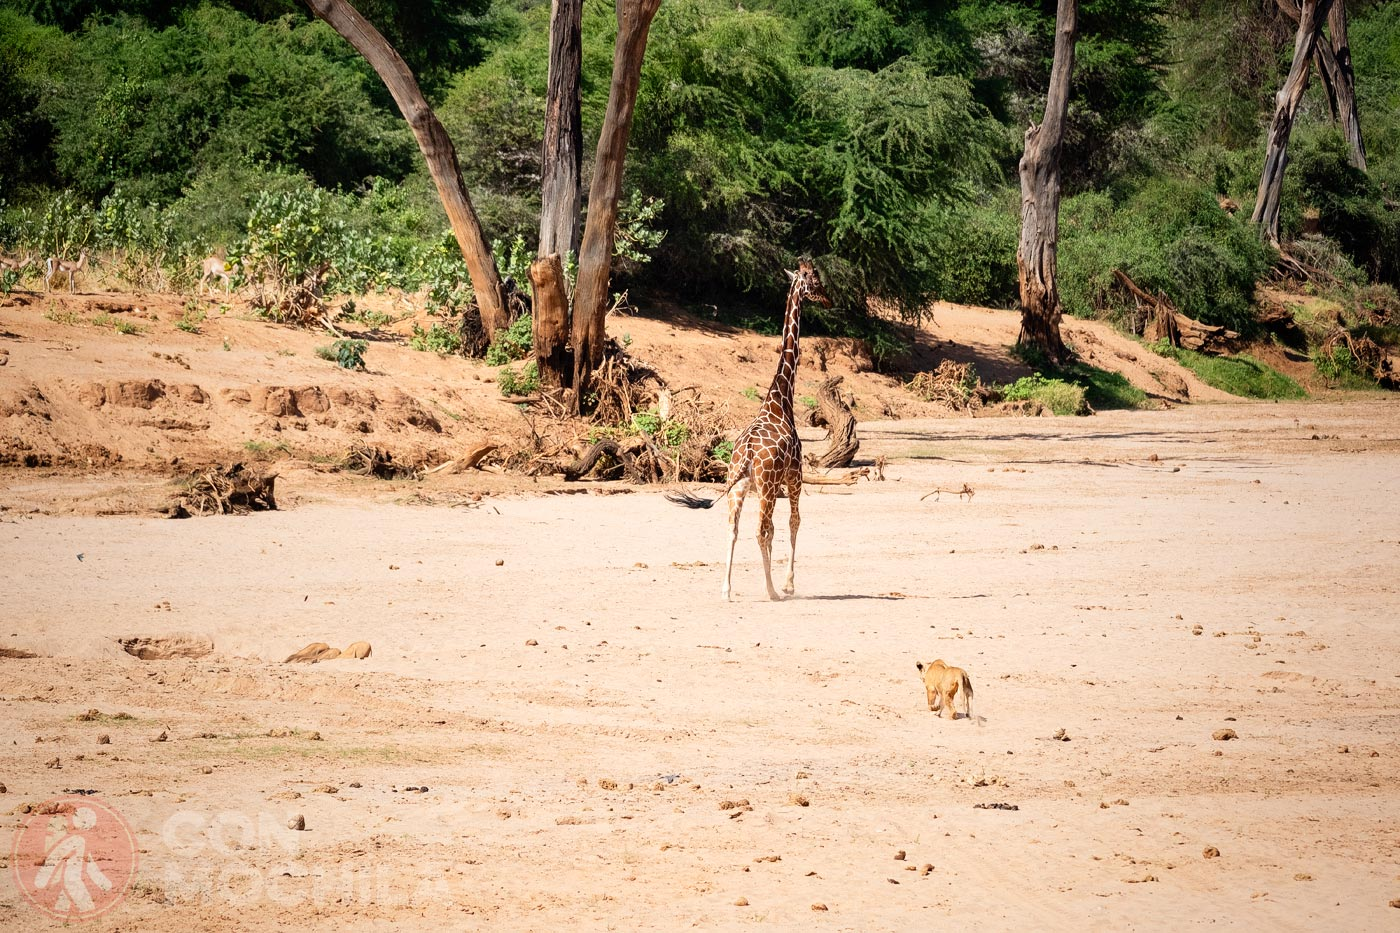 La jirafa ve a la leona y empieza a correr